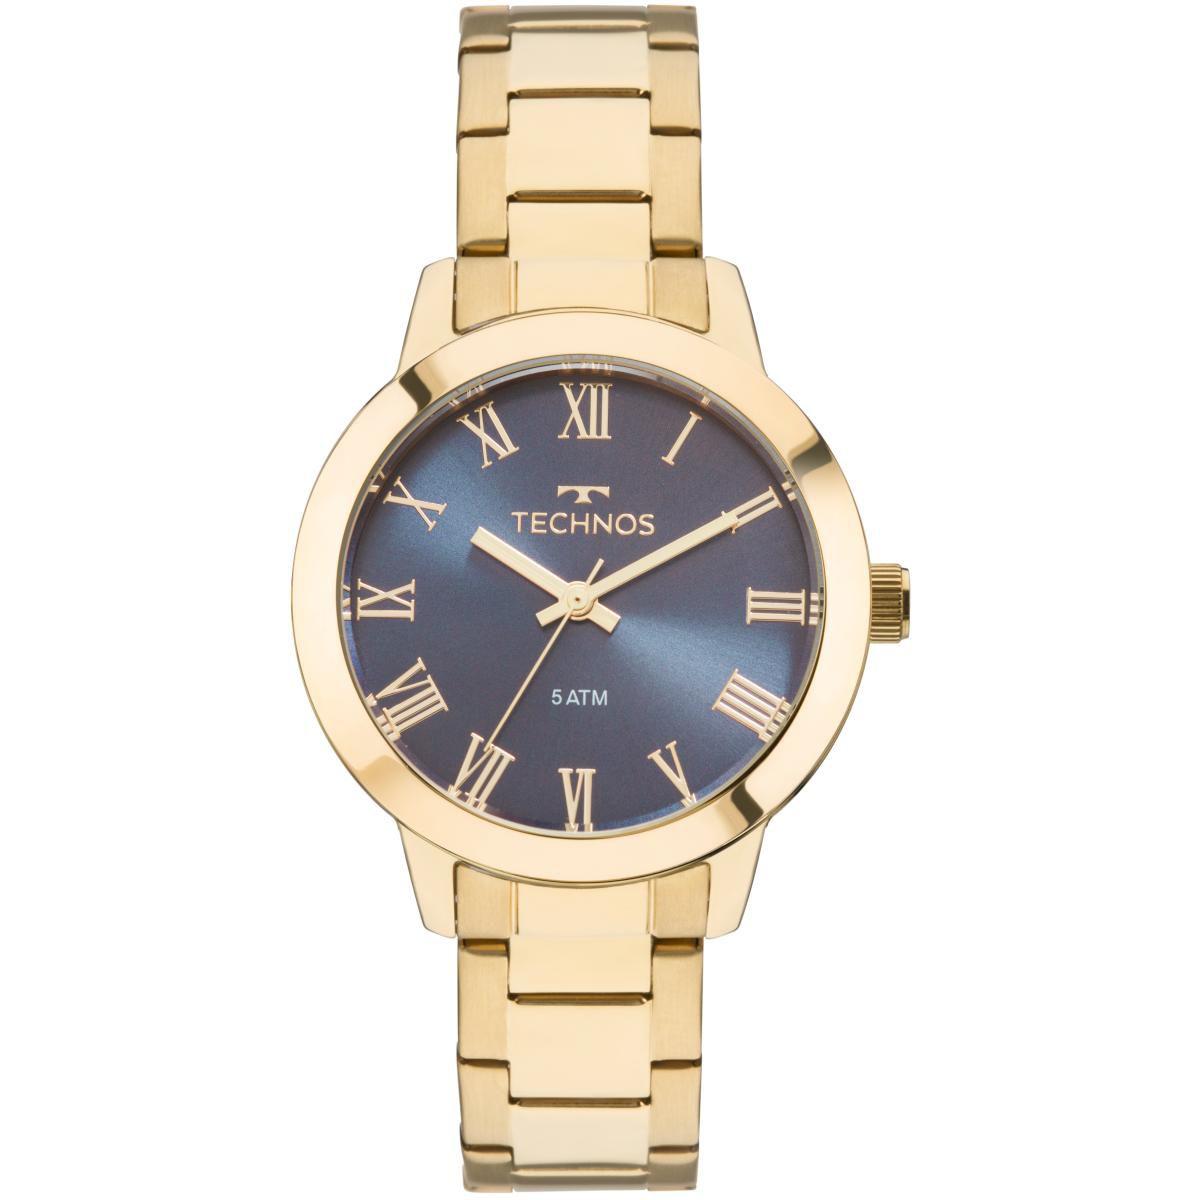 1803e29123d Relógio Feminino Technos Boutique 2035MKU 4A Pulseira Aço Dourada